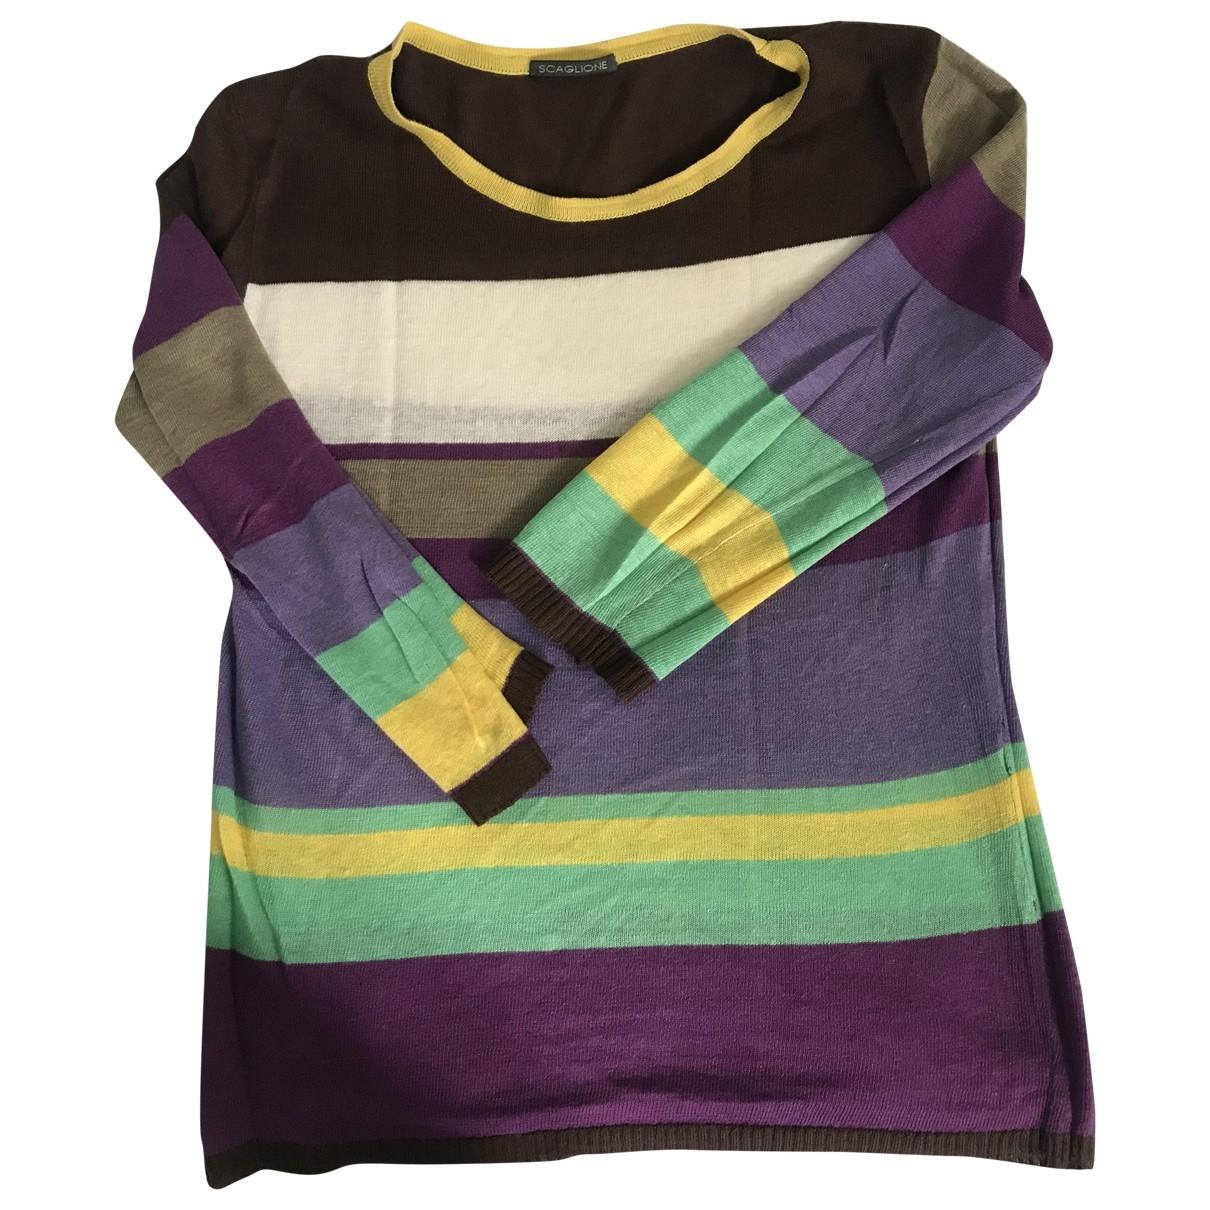 Scaglione - Pull   pour femme en coton - multicolore